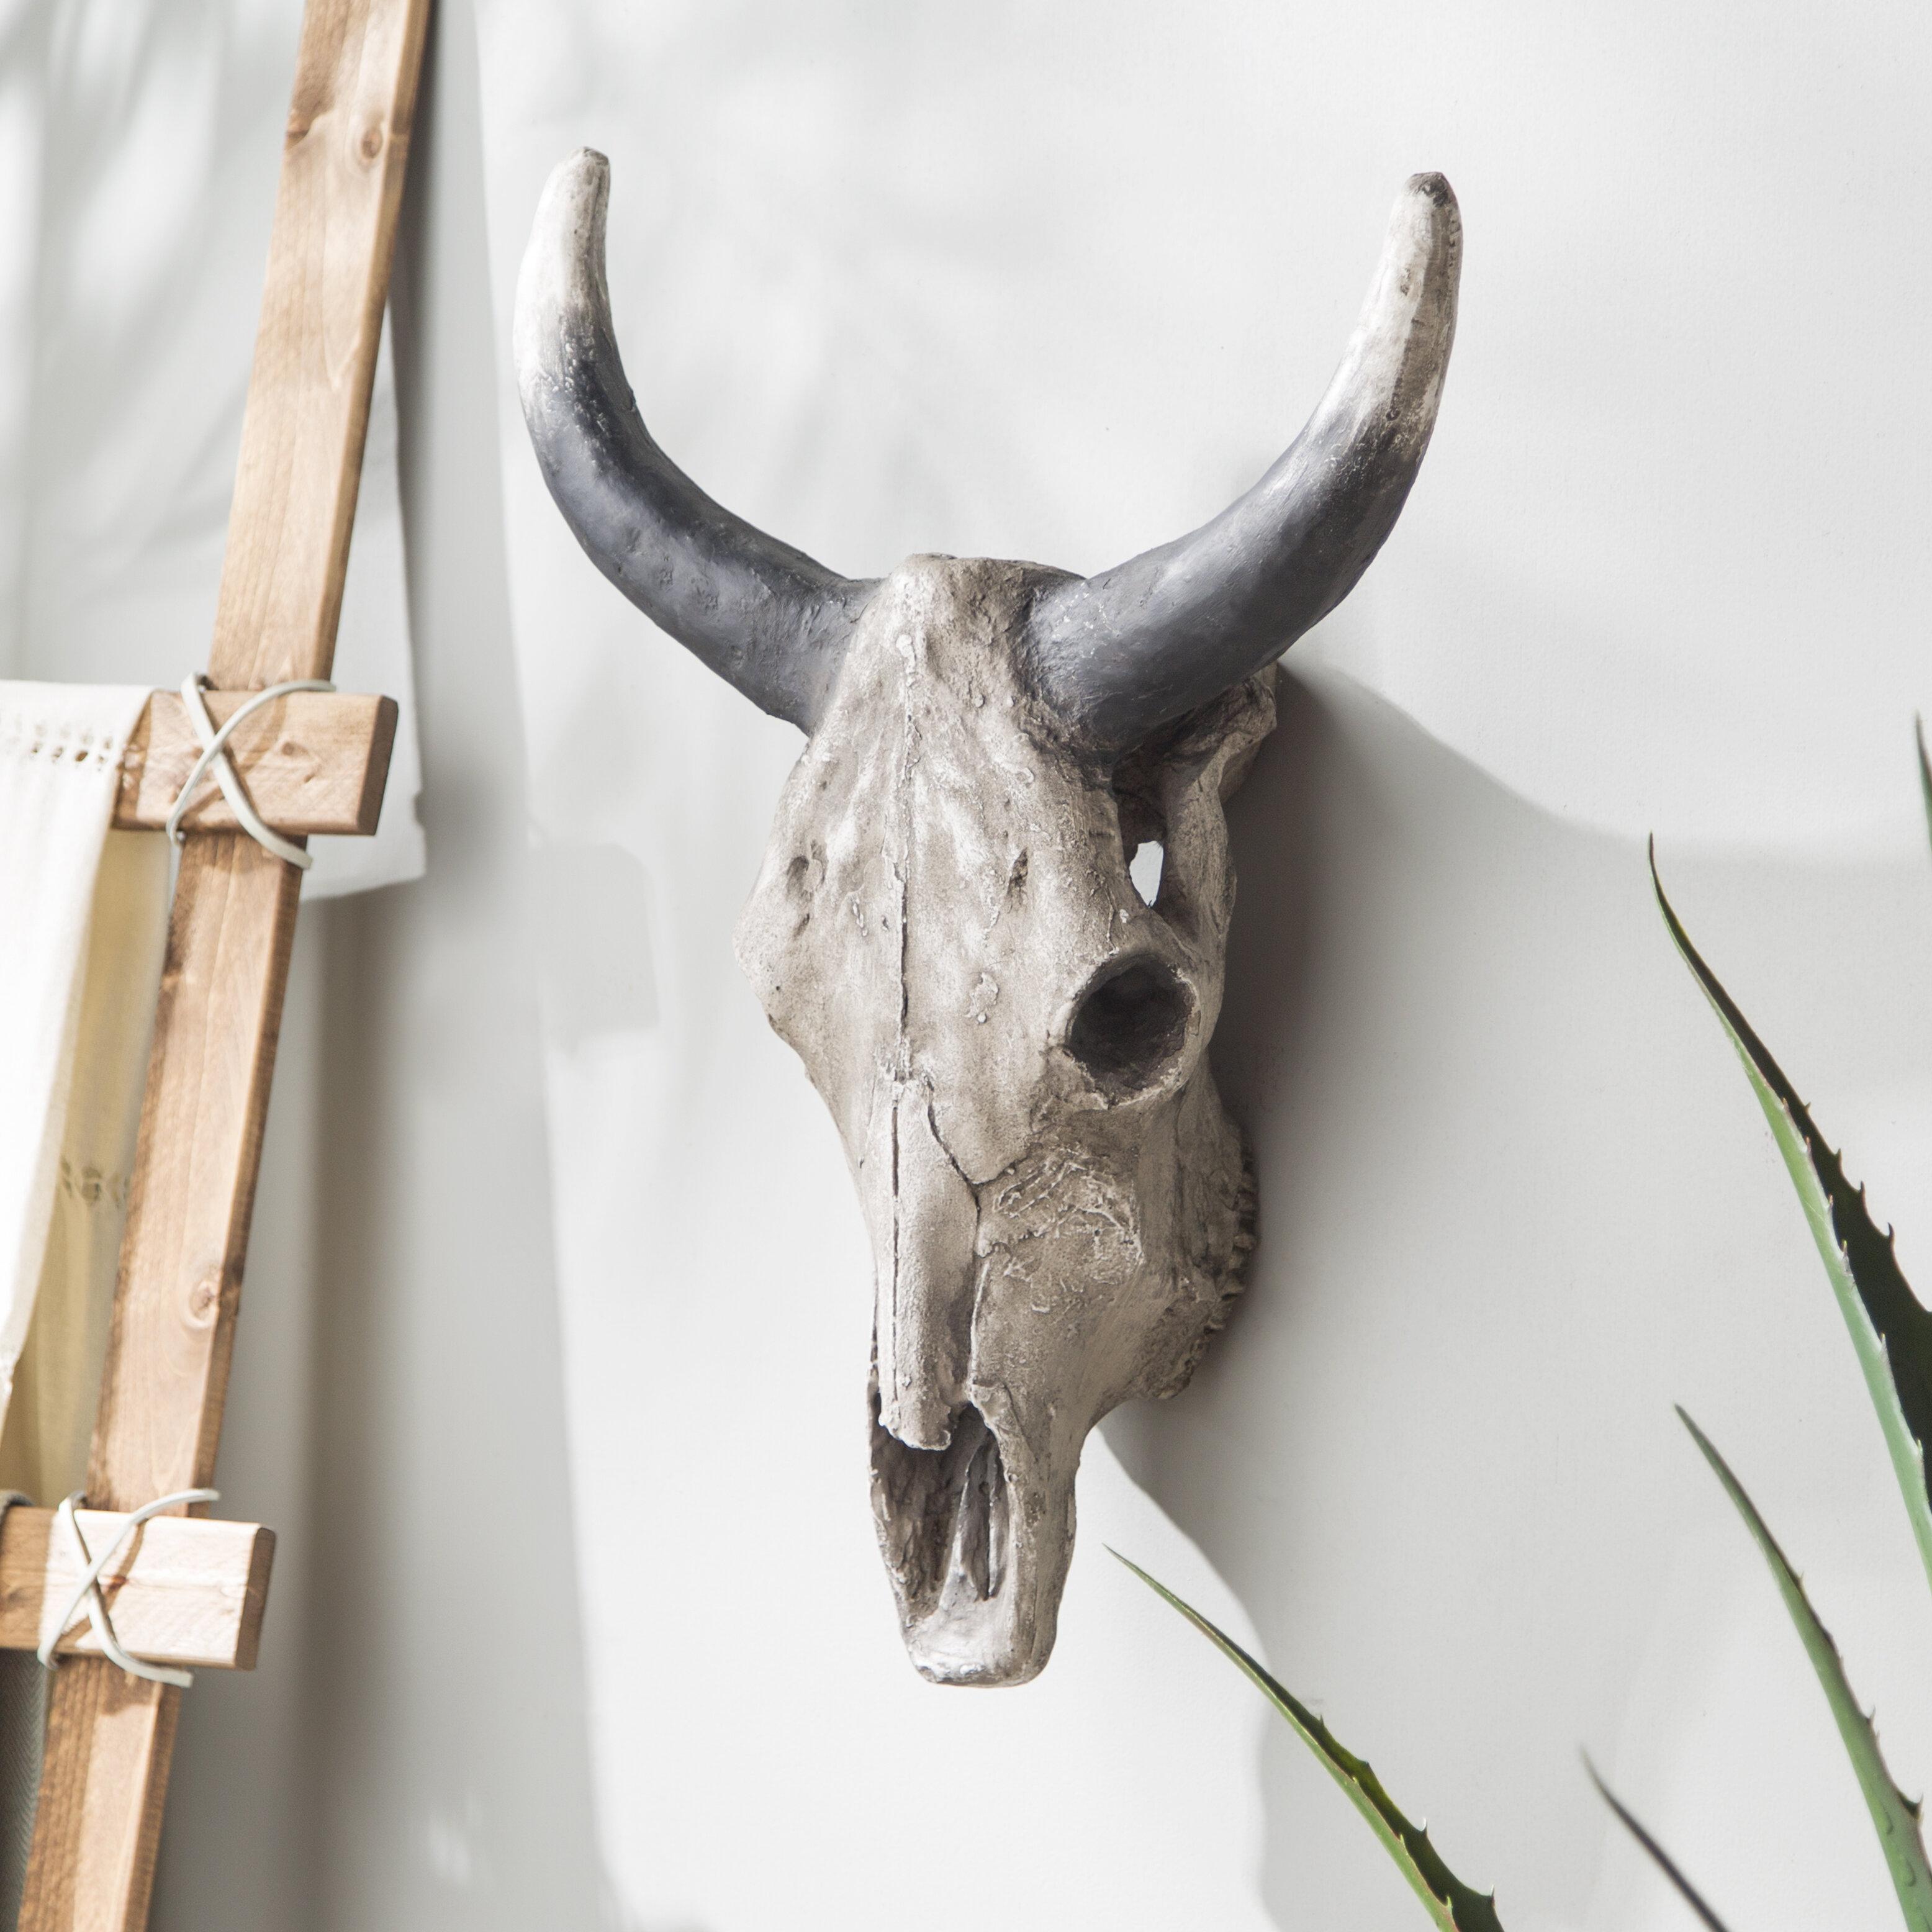 animal head wall decor Union Rustic Polyresin Animal Head Wall Décor & Reviews | Wayfair animal head wall decor